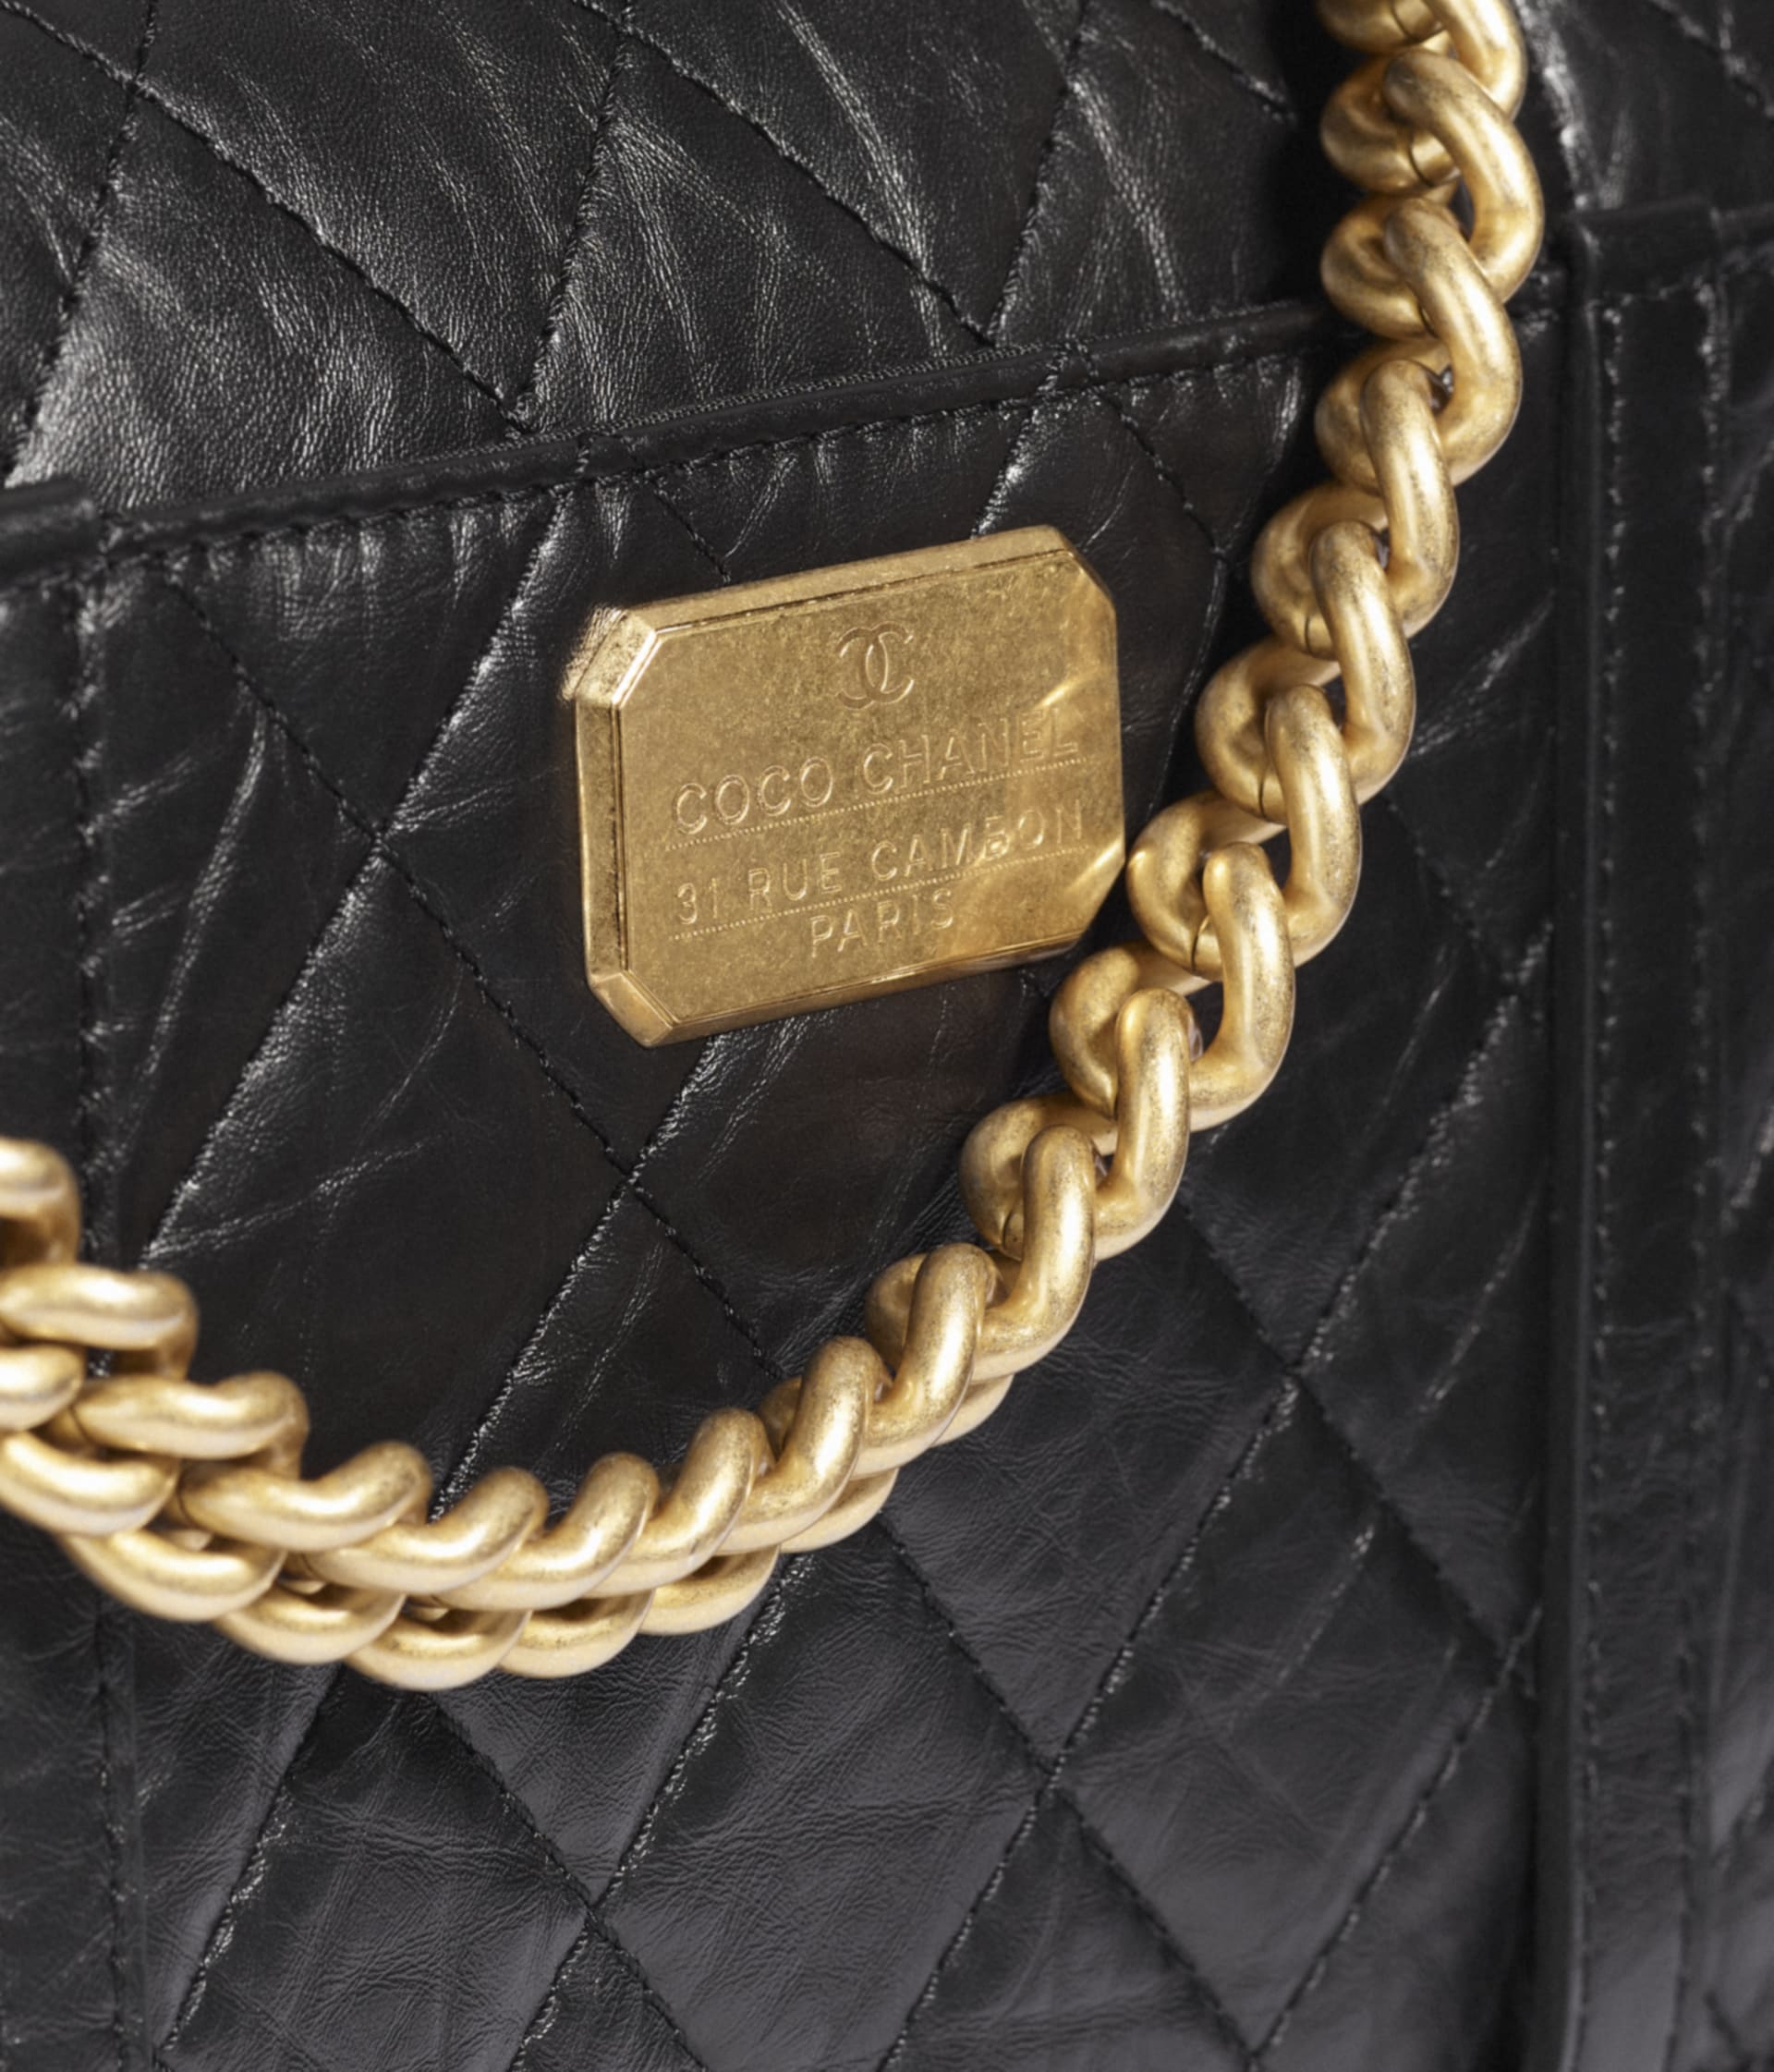 image 4 - Flap Bag - Aged Calfskin & Gold-Tone Metal - Black